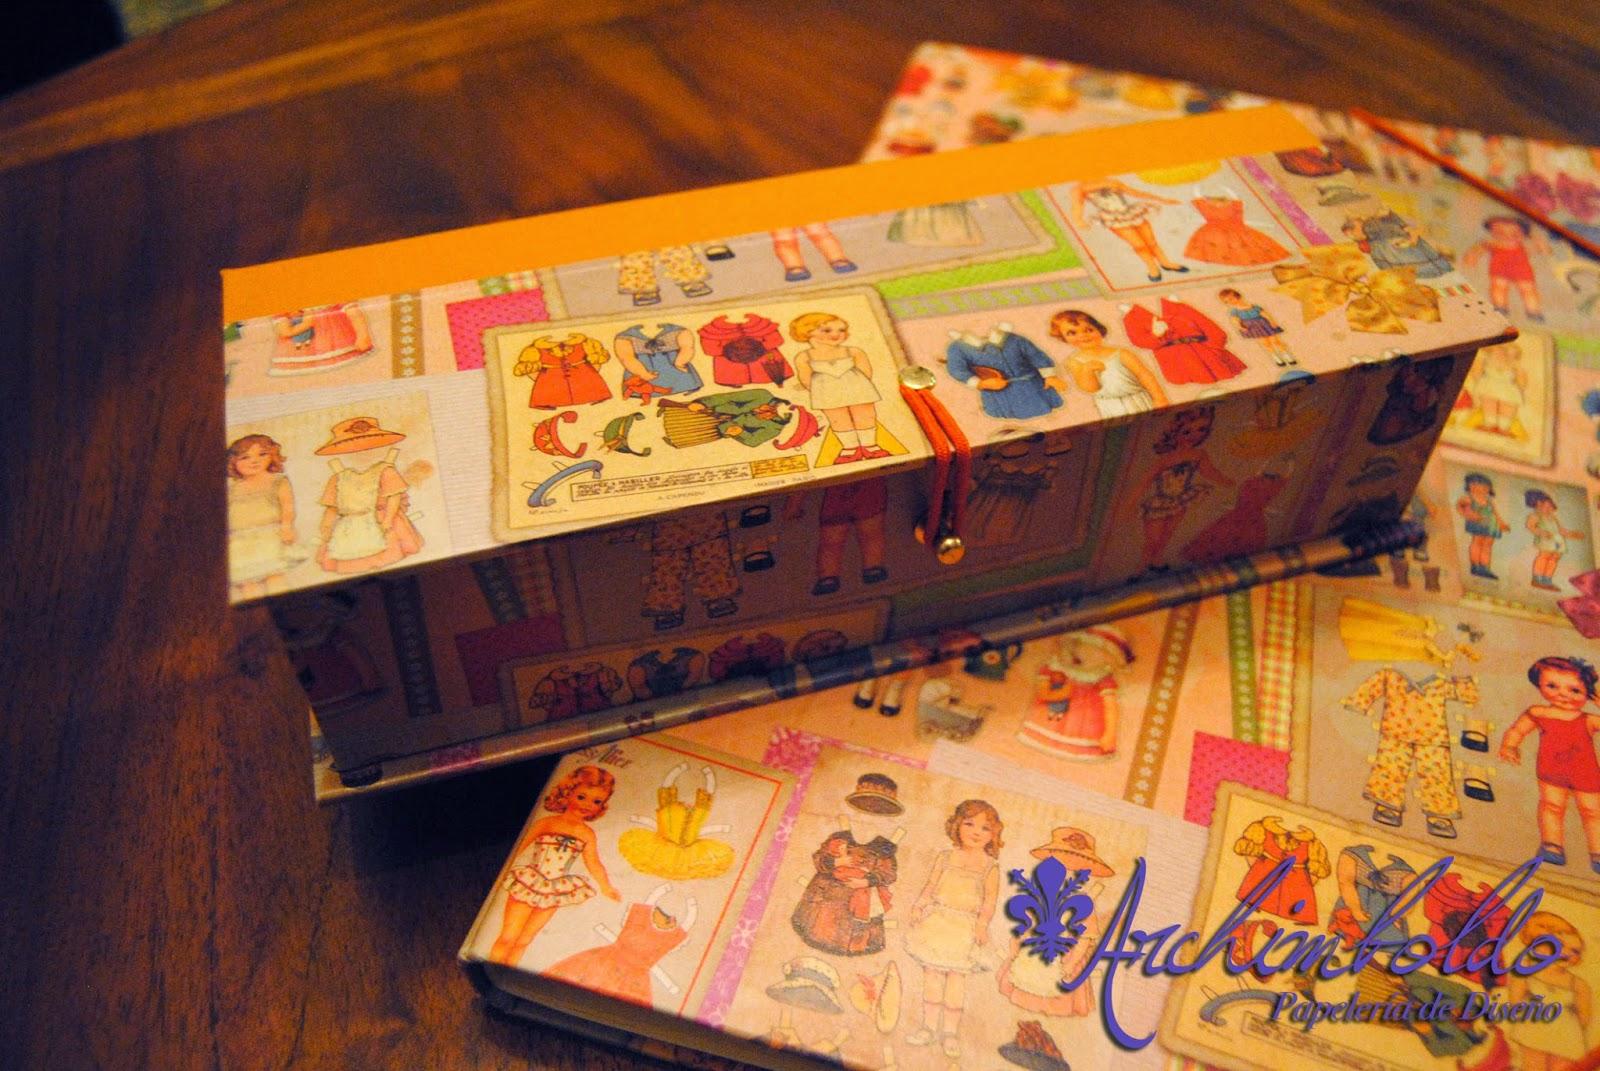 cartonage cartonnage cartonaje